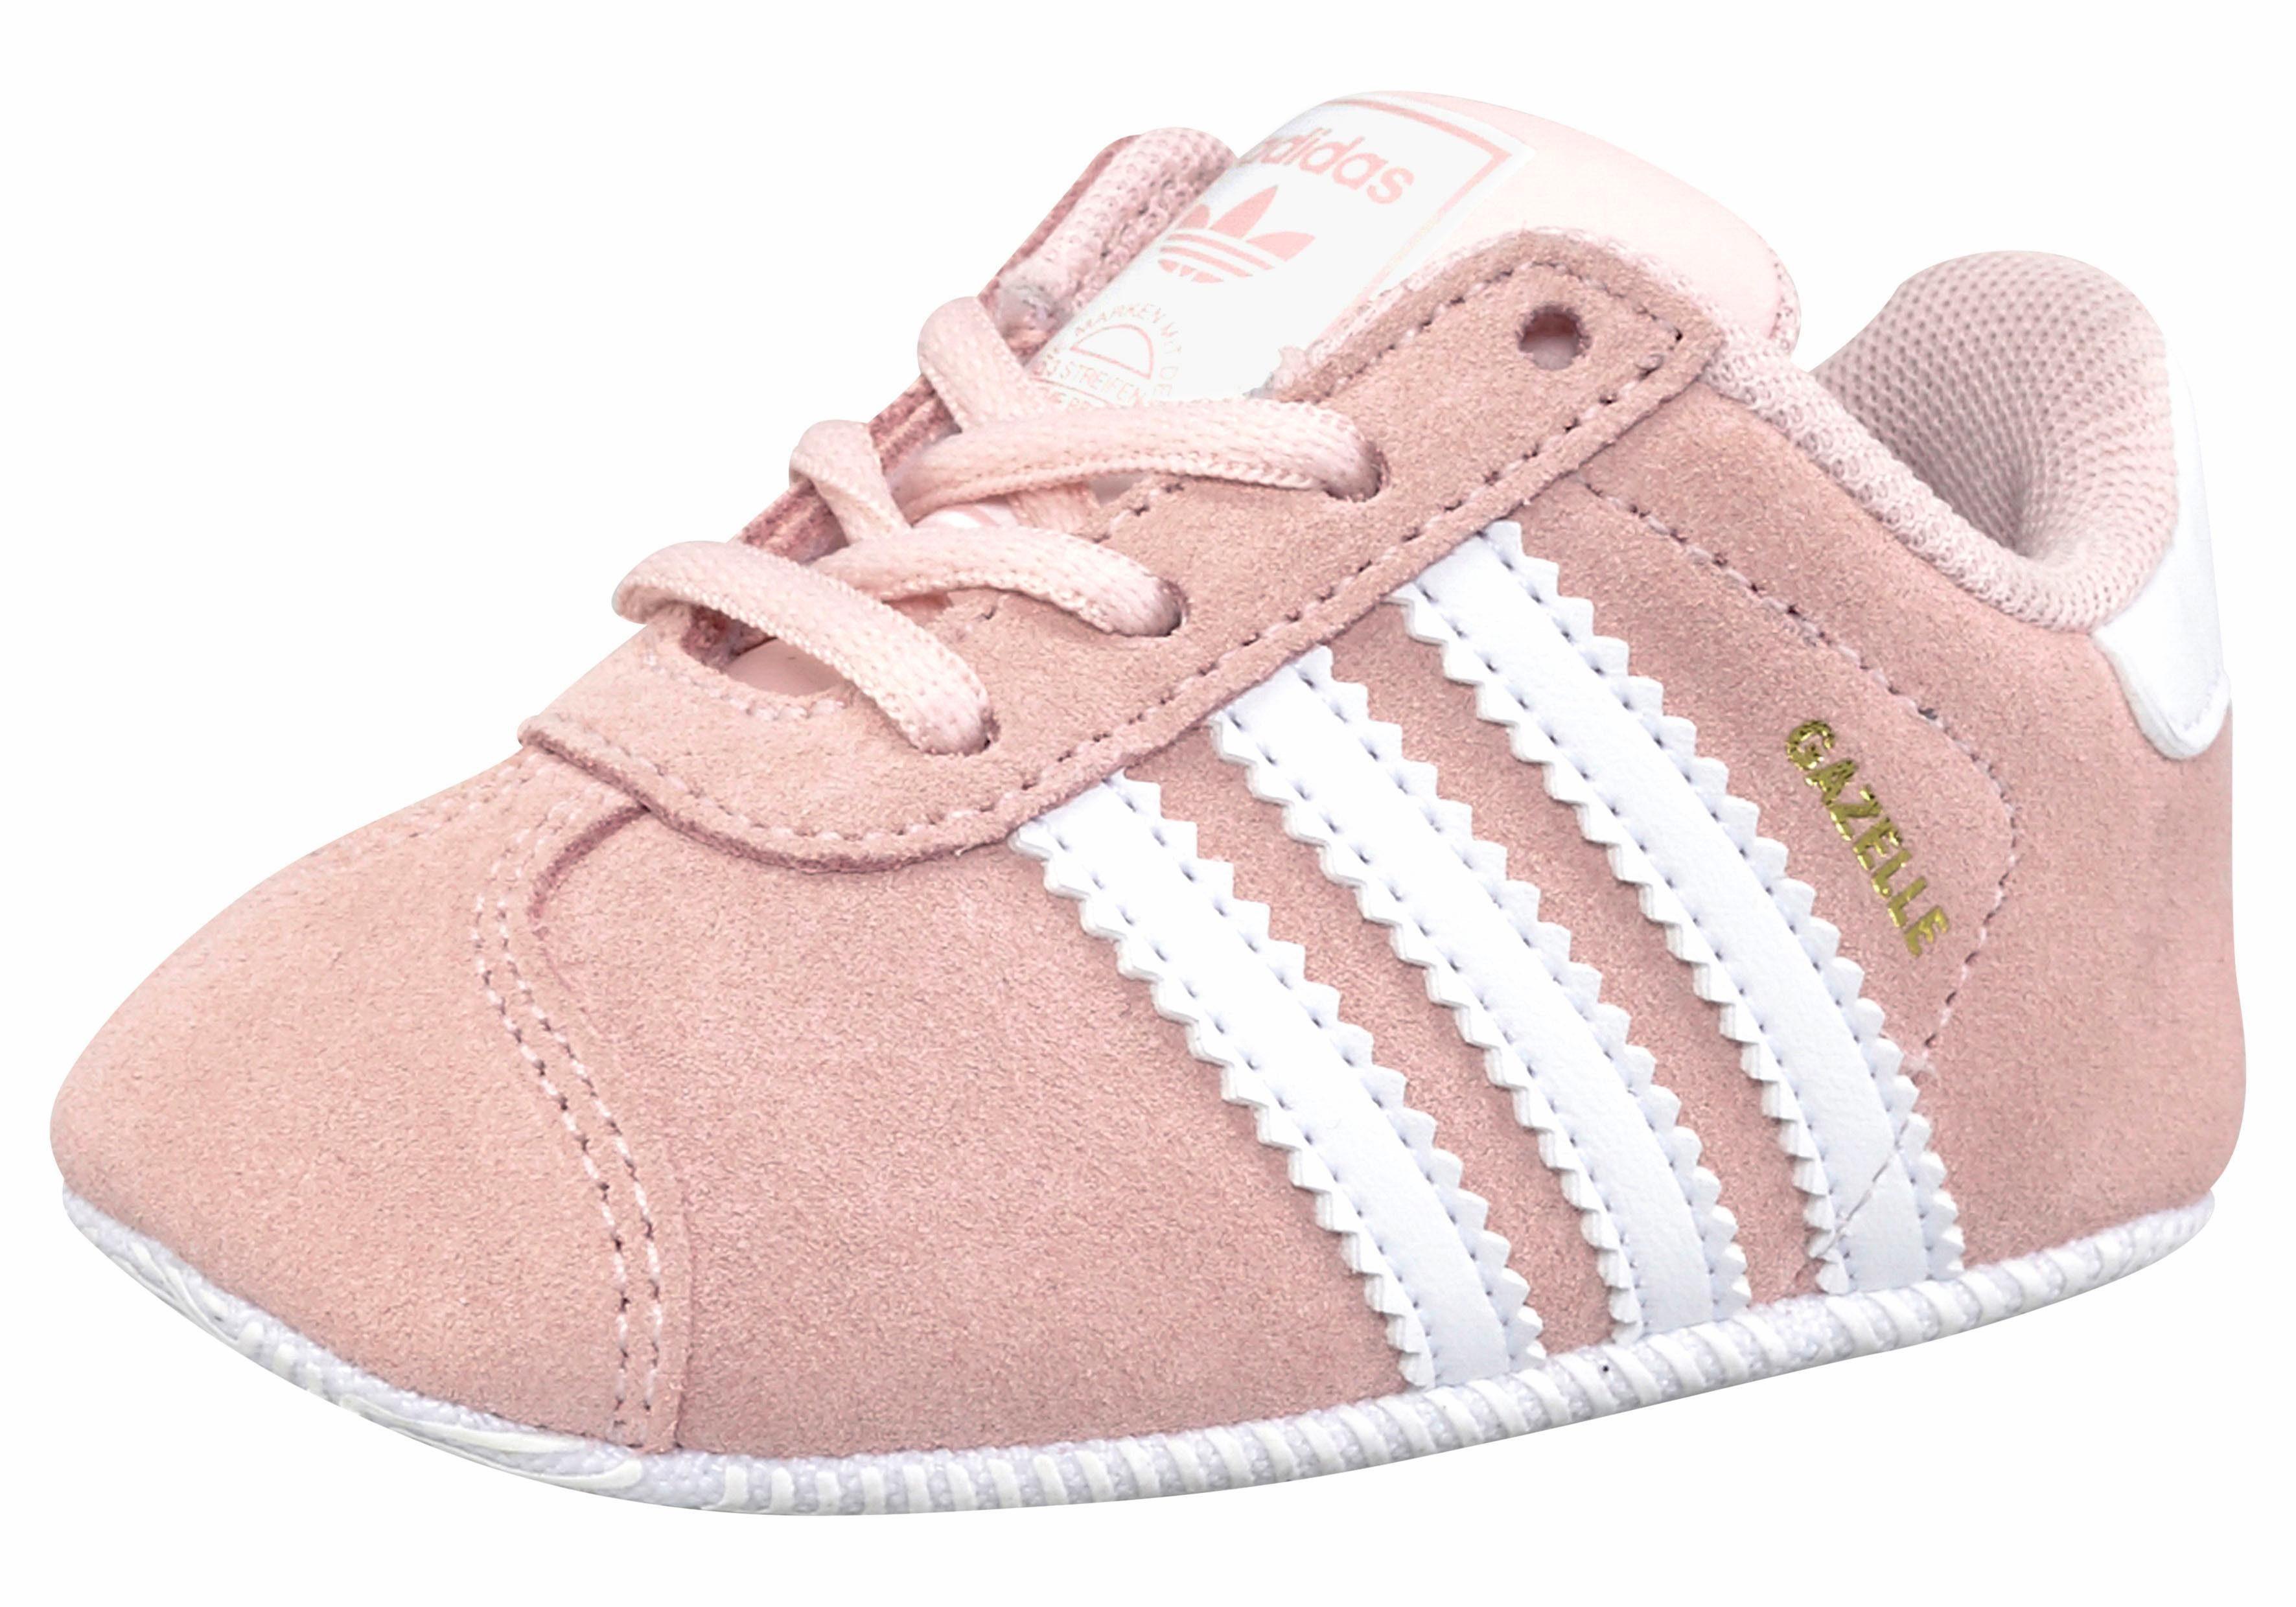 adidas baby gazelle pink